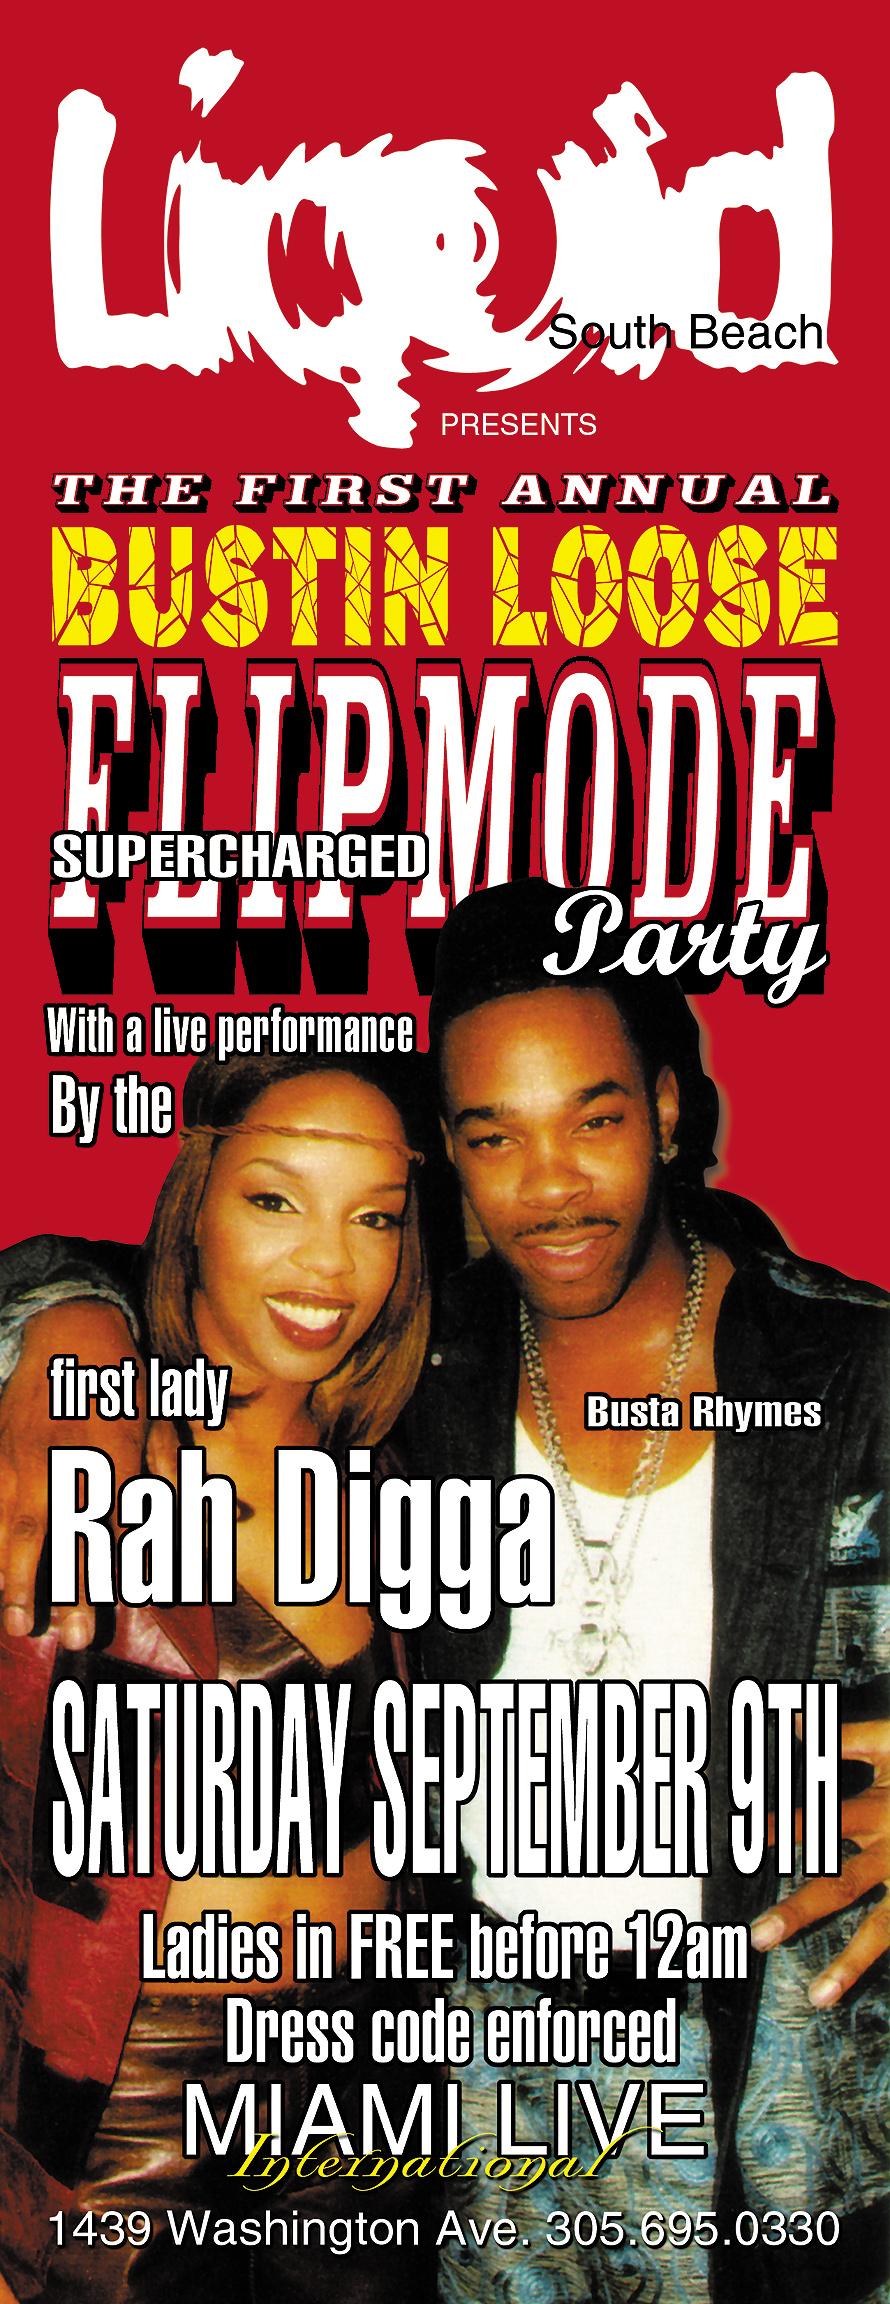 Flipmode Squad Party at Liquid Night Club